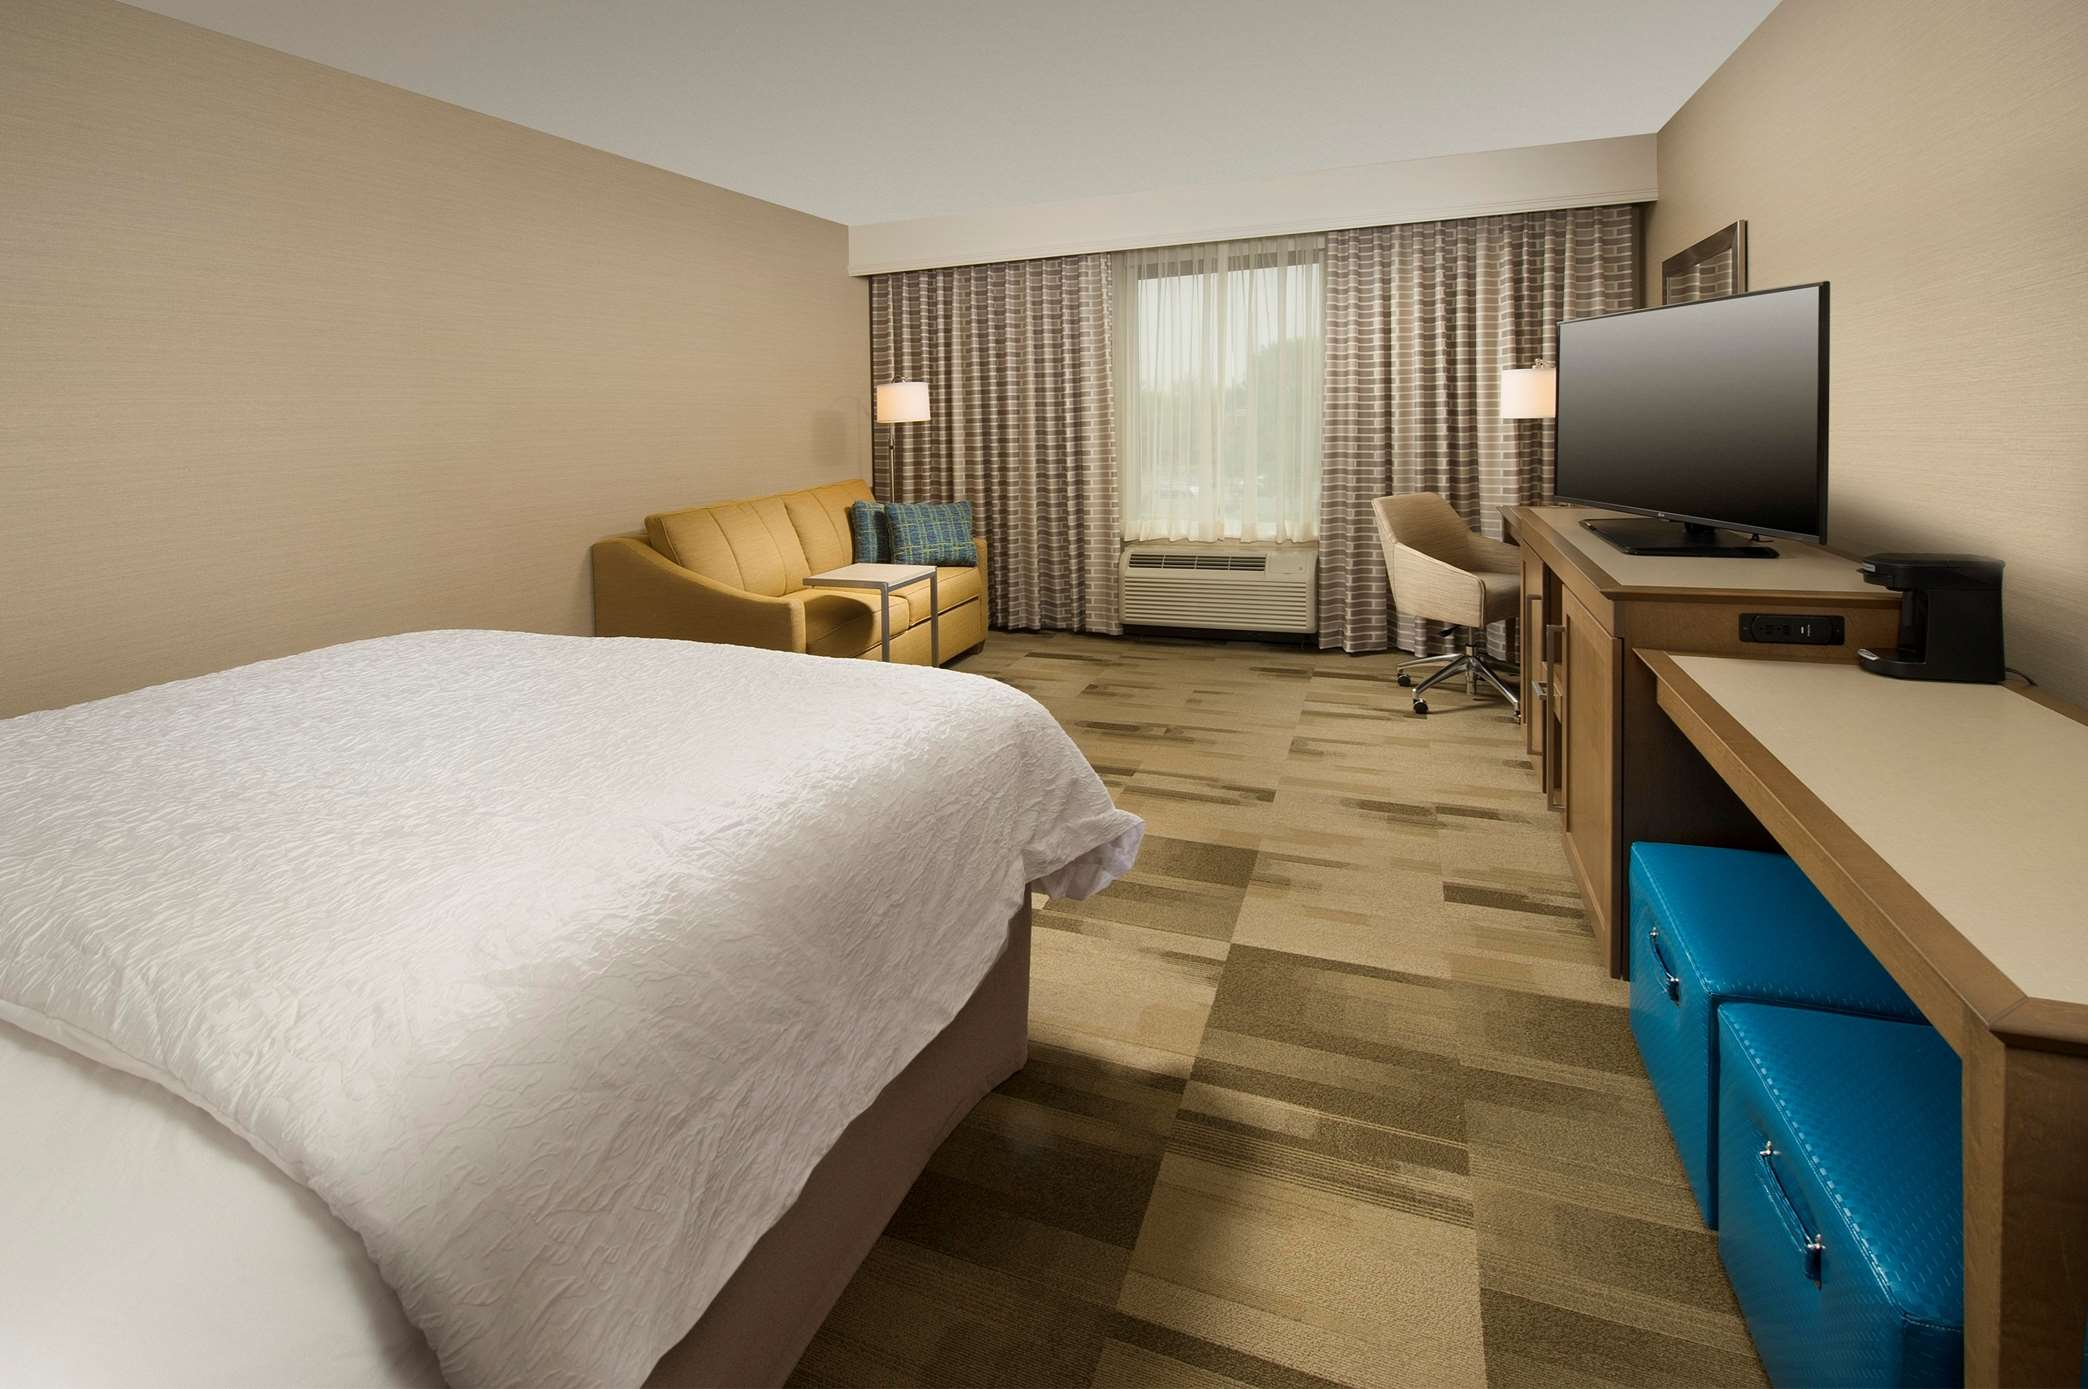 Hampton Inn & Suites Syracuse/Carrier Circle image 7